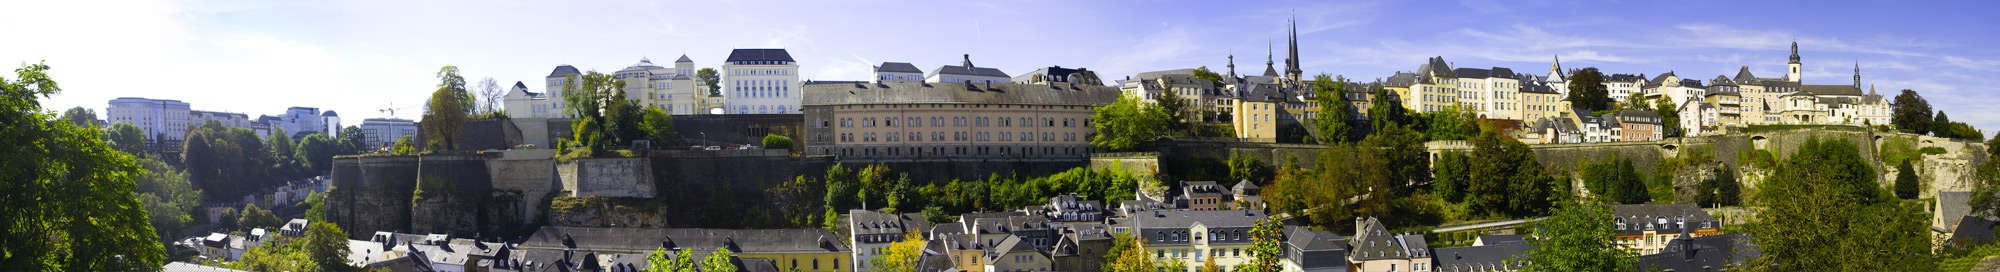 Week end e soggiorni Lussemburgo